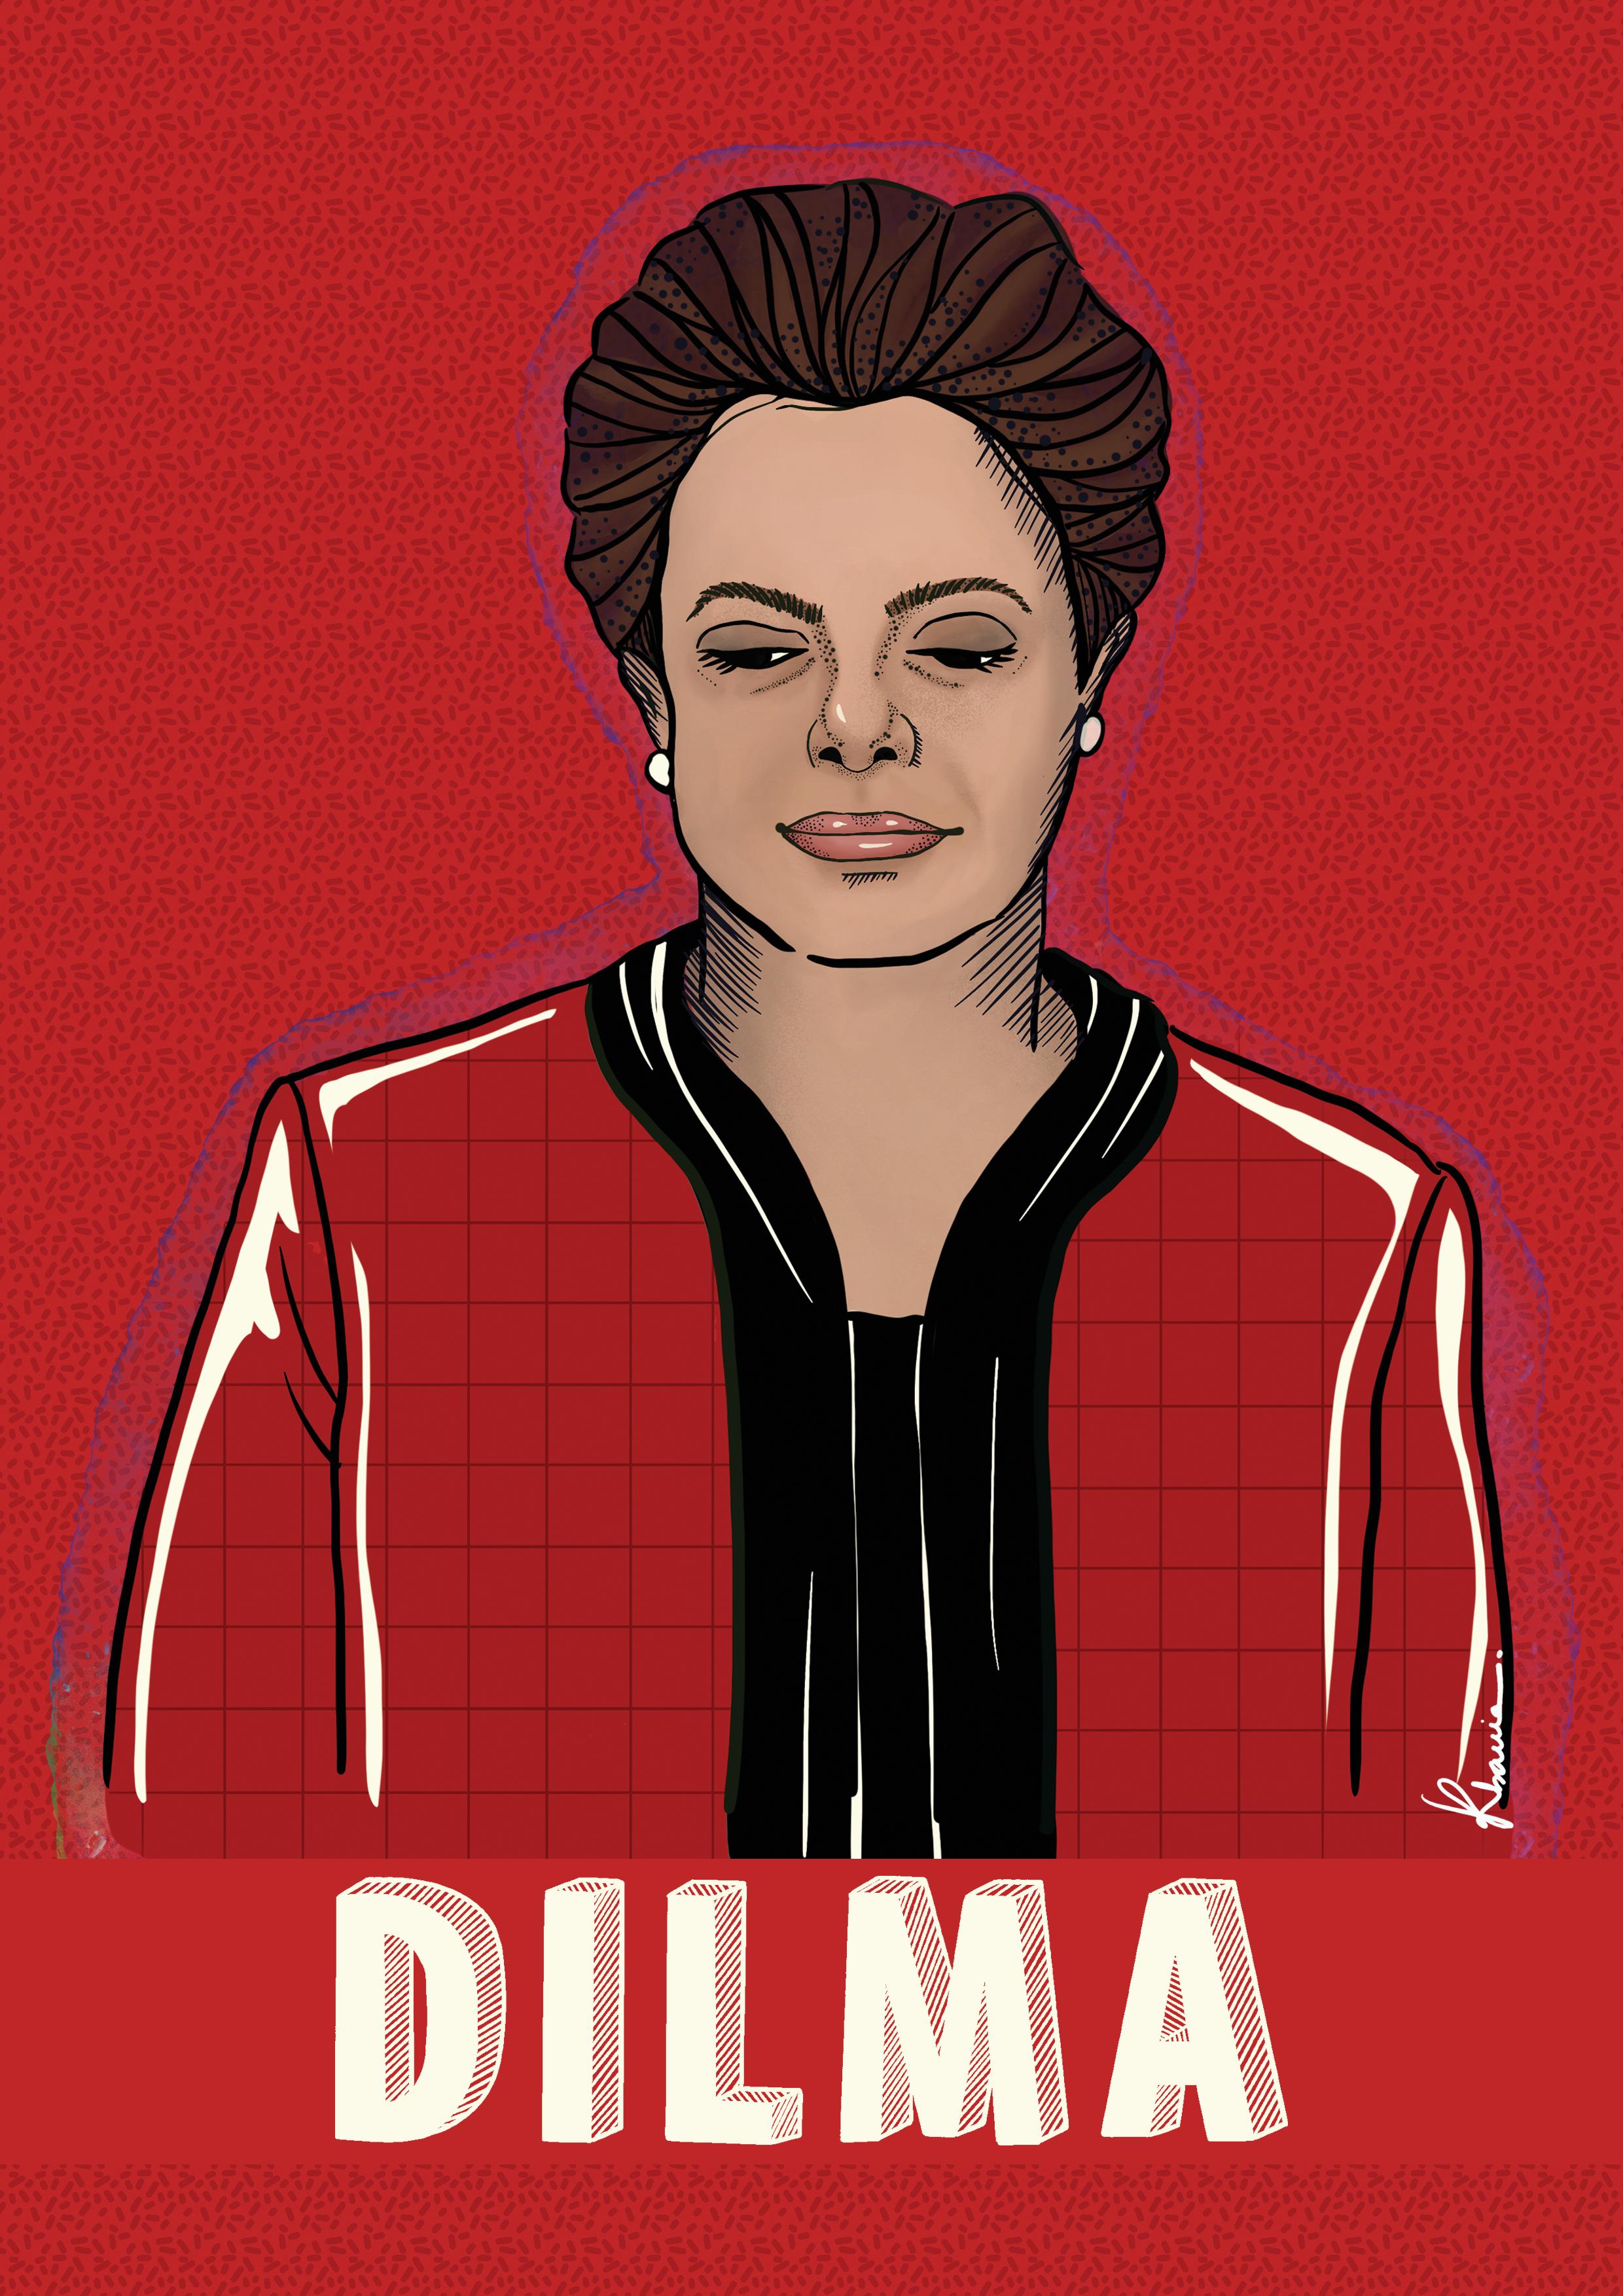 Dilma by Katia Barria